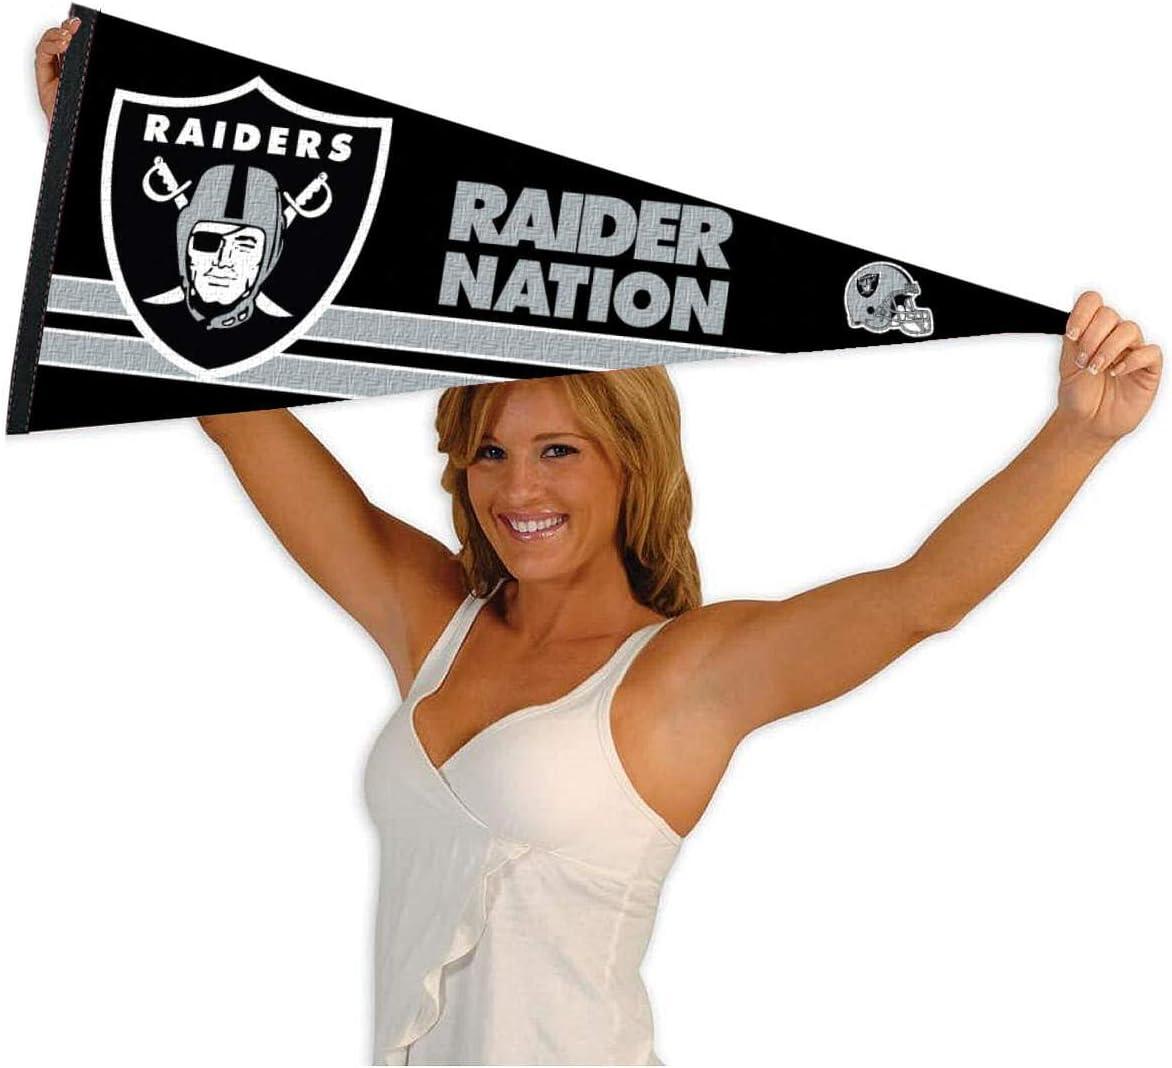 WinCraft Las Vegas Raiders Raider Nation Pennant Banner Flag